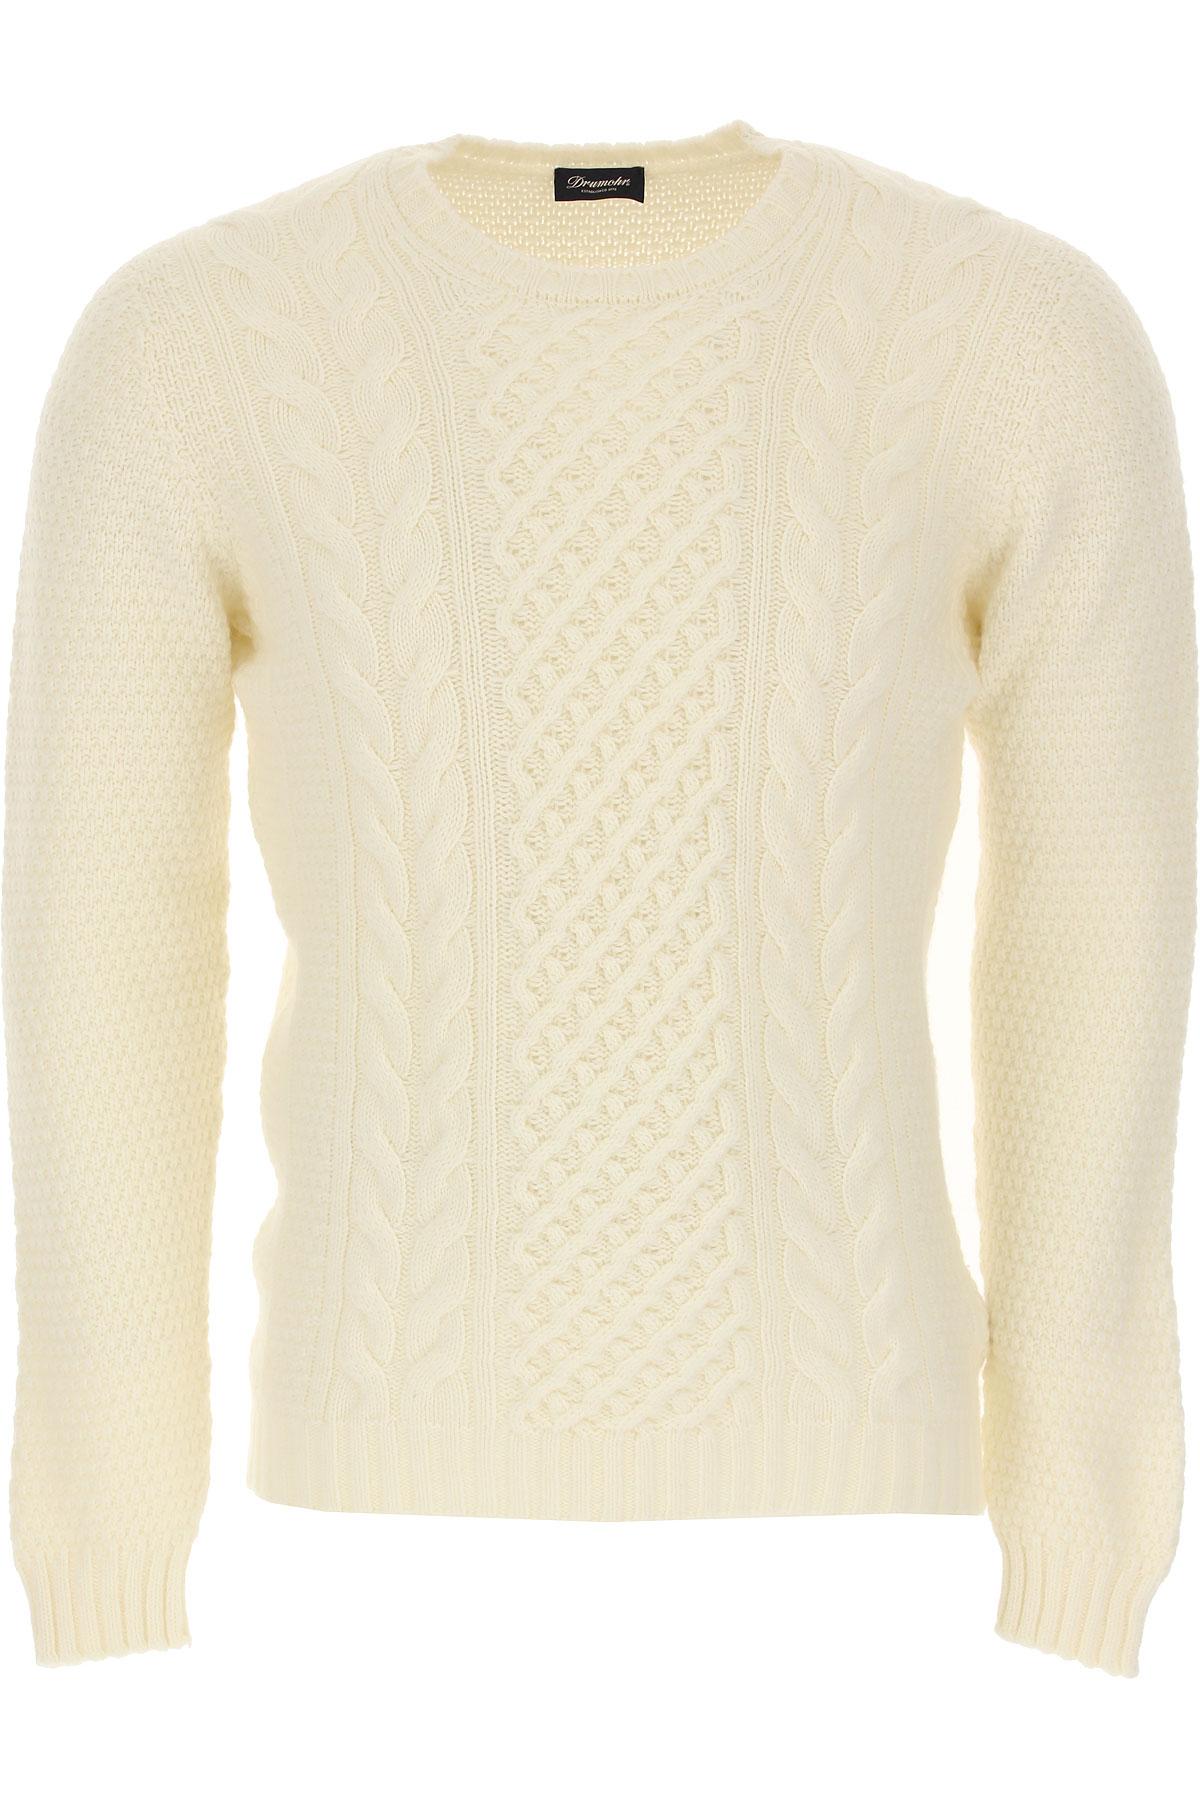 Drumohr Sweater for Men Jumper On Sale, White, Lambswool, 2019, M XL